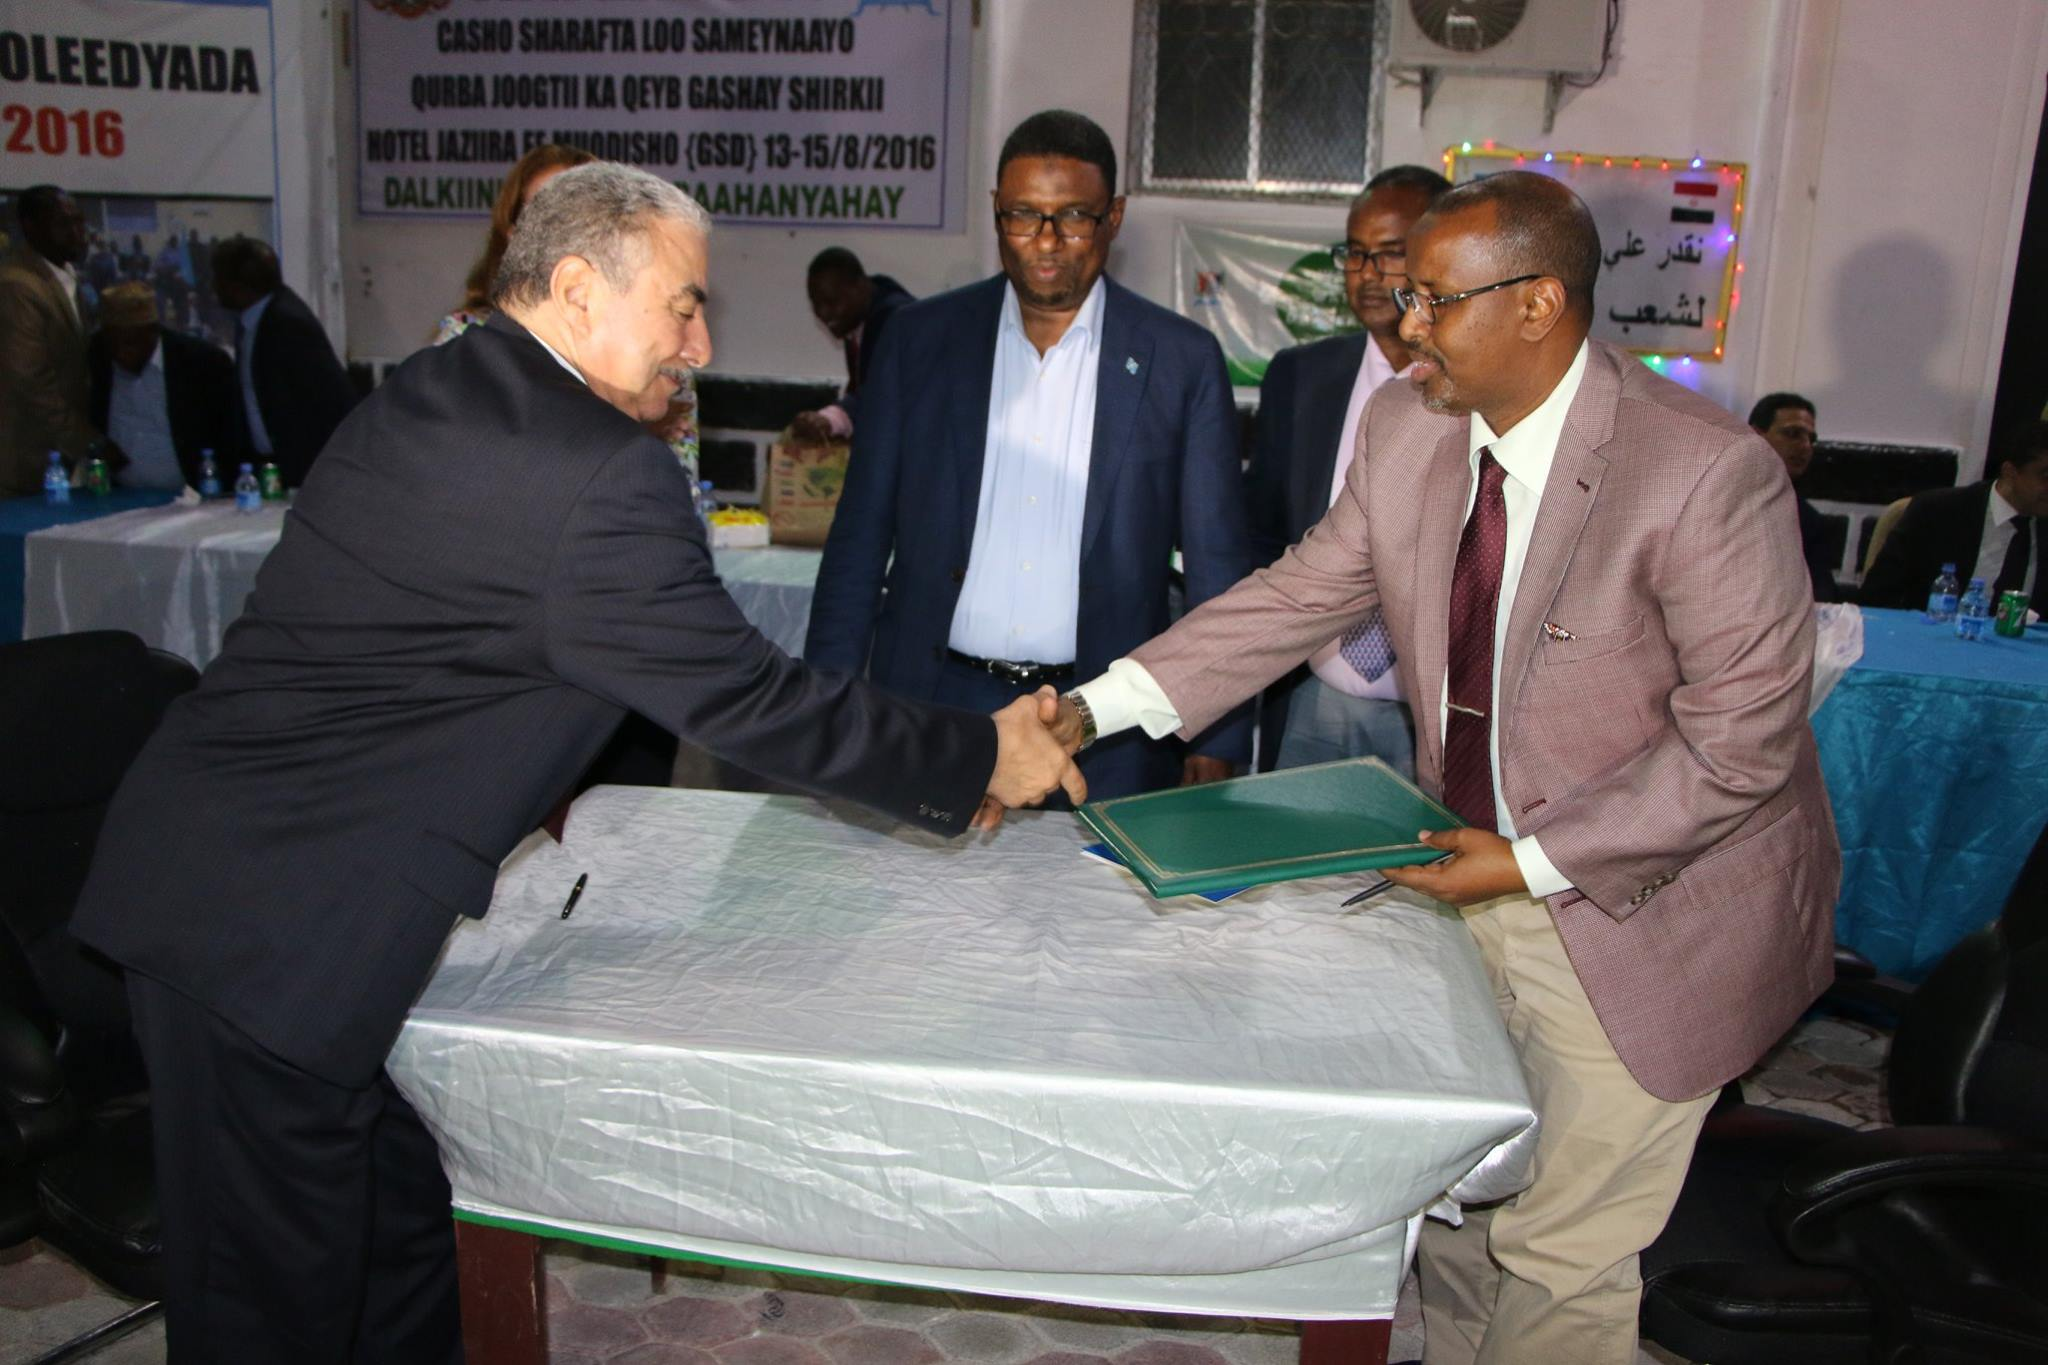 somalia chamber of commerce2 Egyption Chamber of Commerce sign MOU with Somali Chamber of Commerce